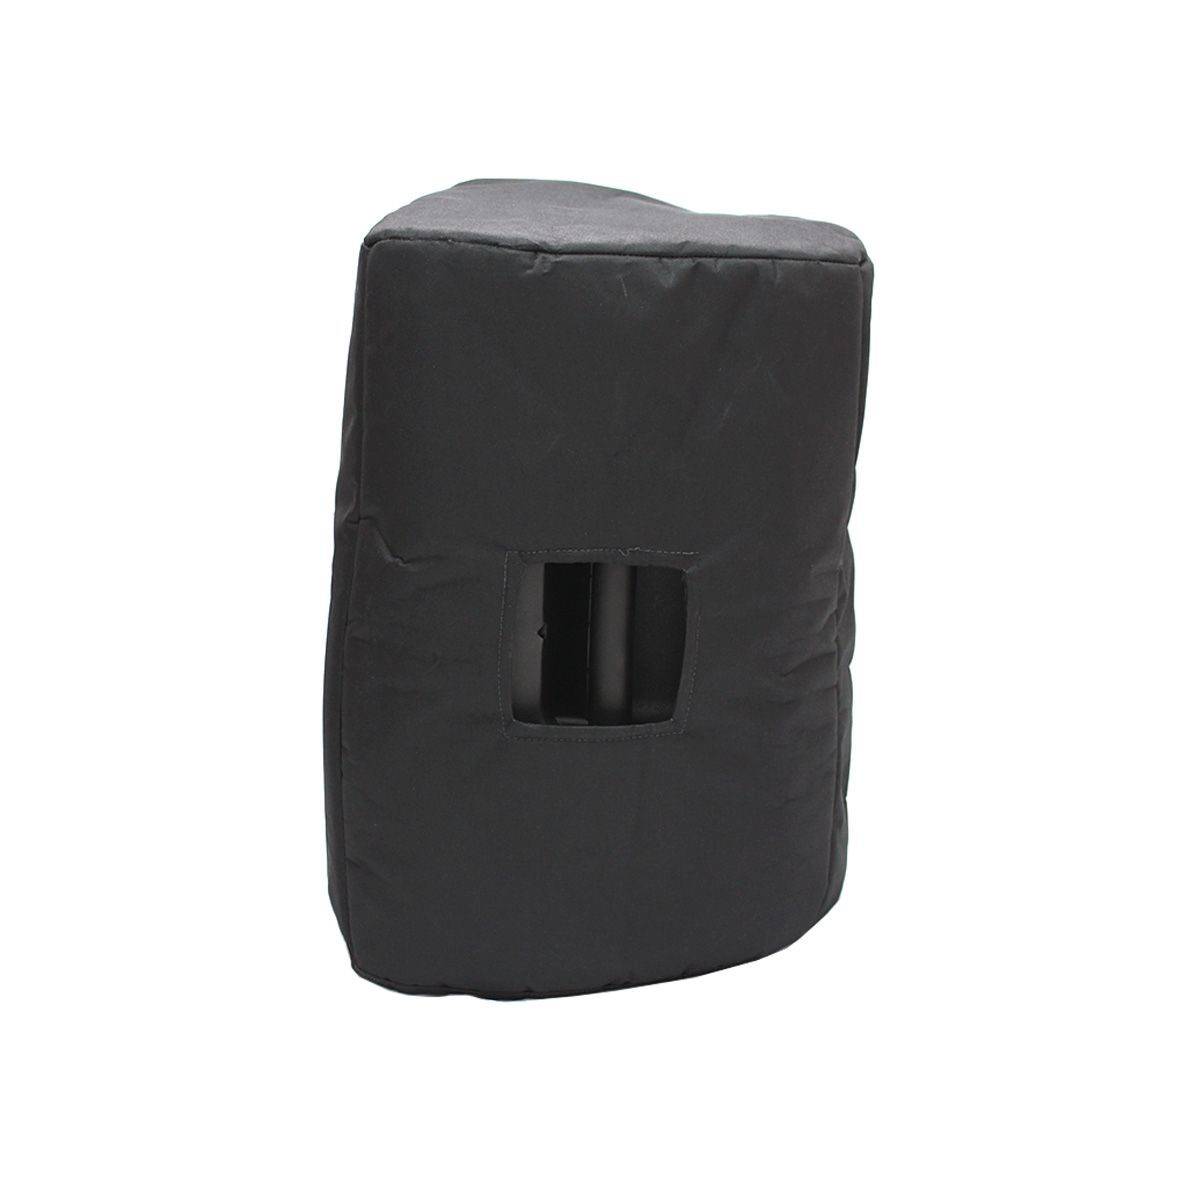 Capa de Prote��o p/ a Caixa CSR 2500 - VR